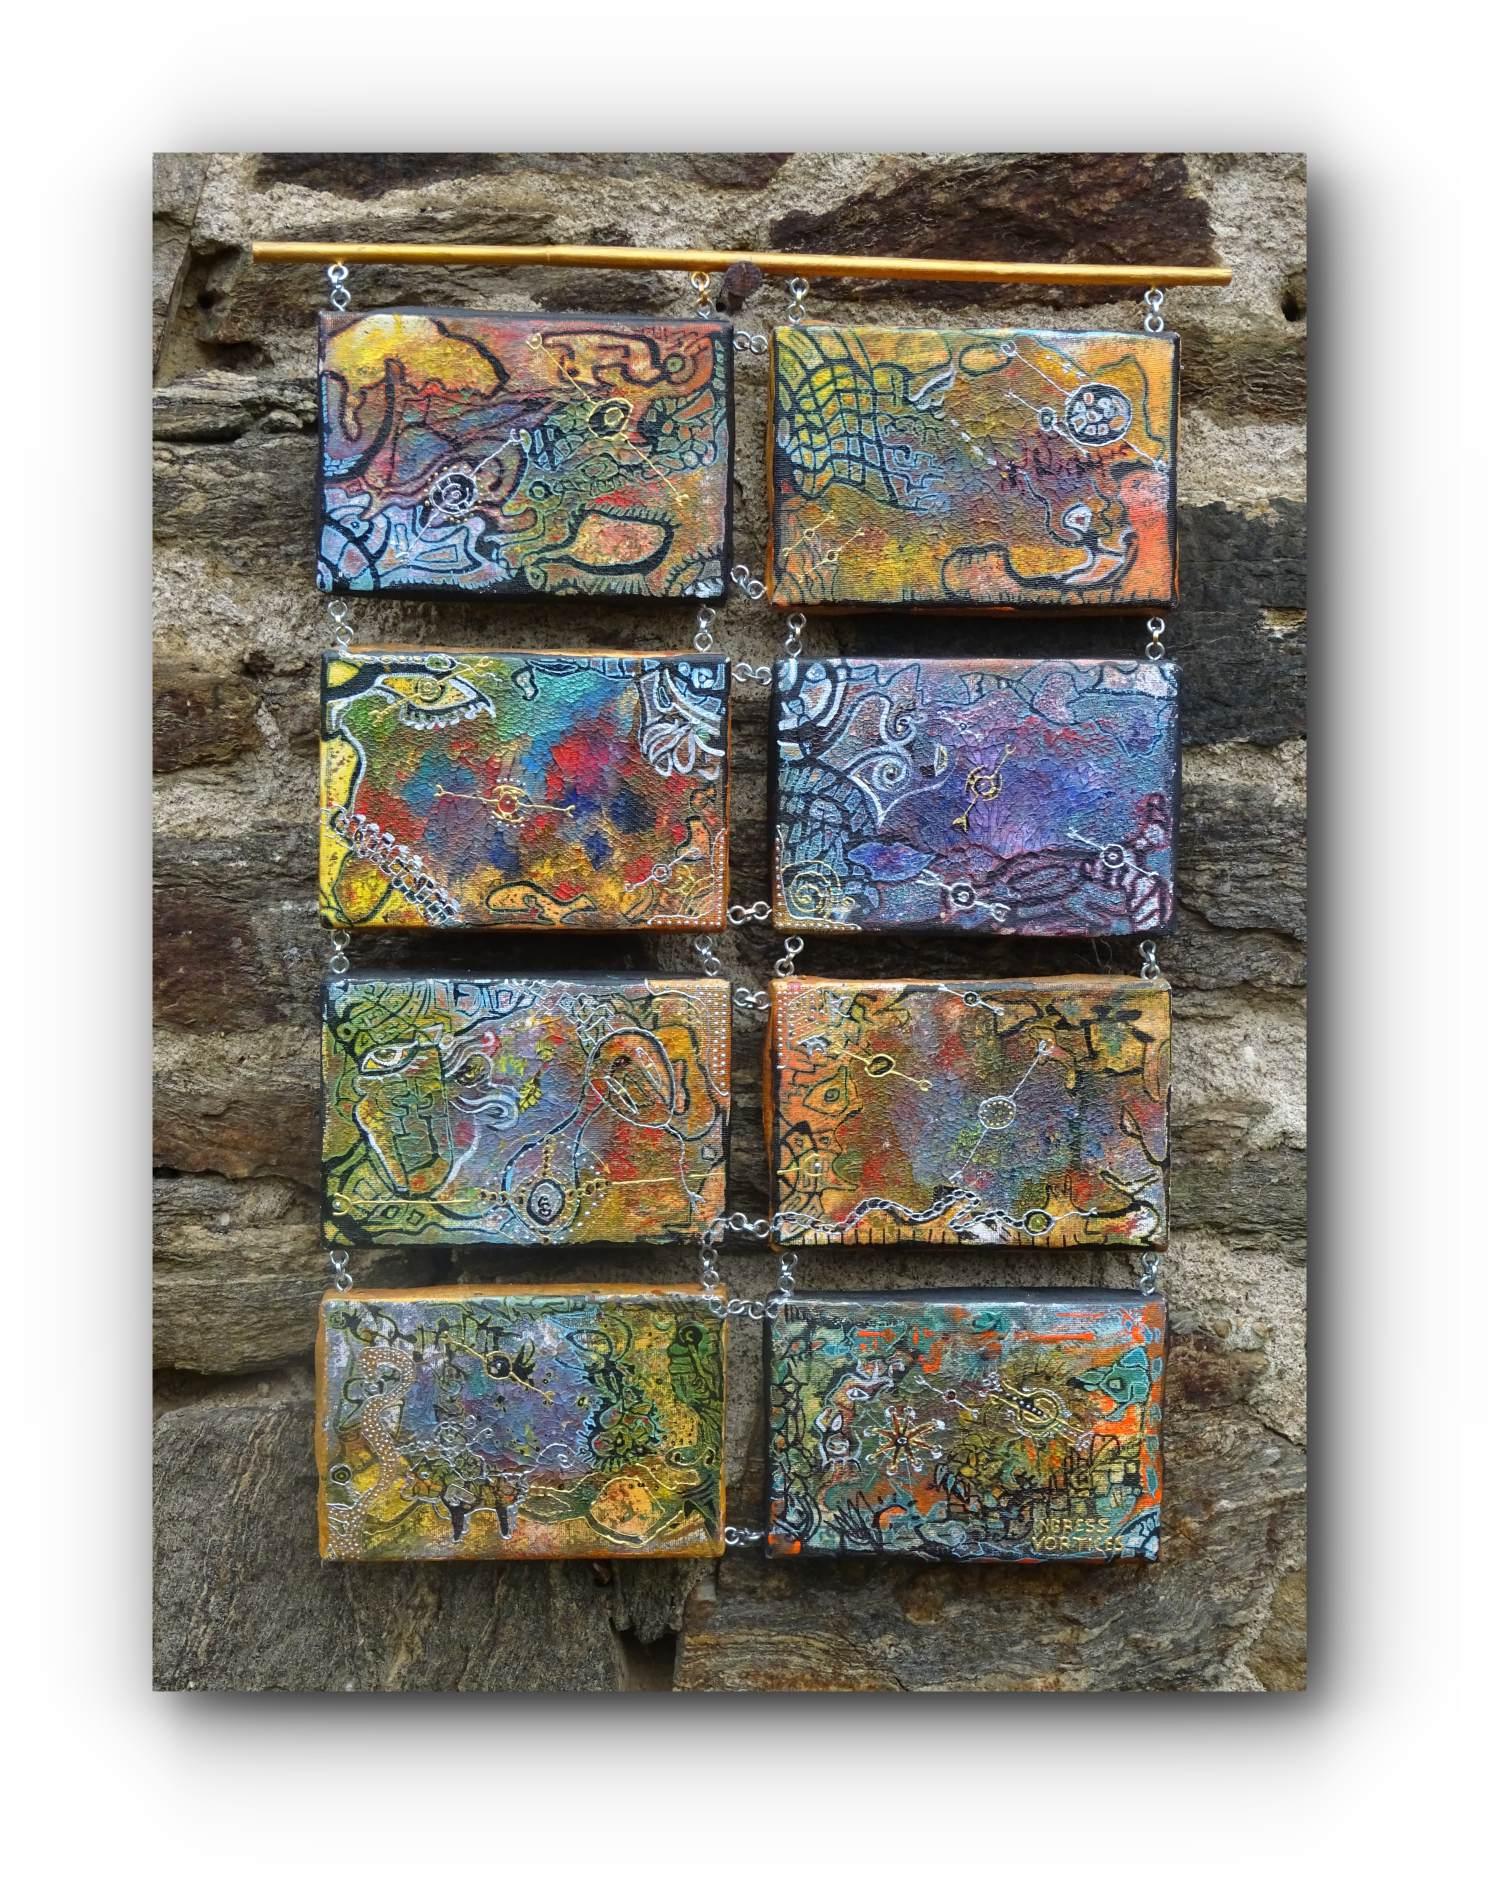 painting-arcana-artist-duo-ingress-vortices.jpg